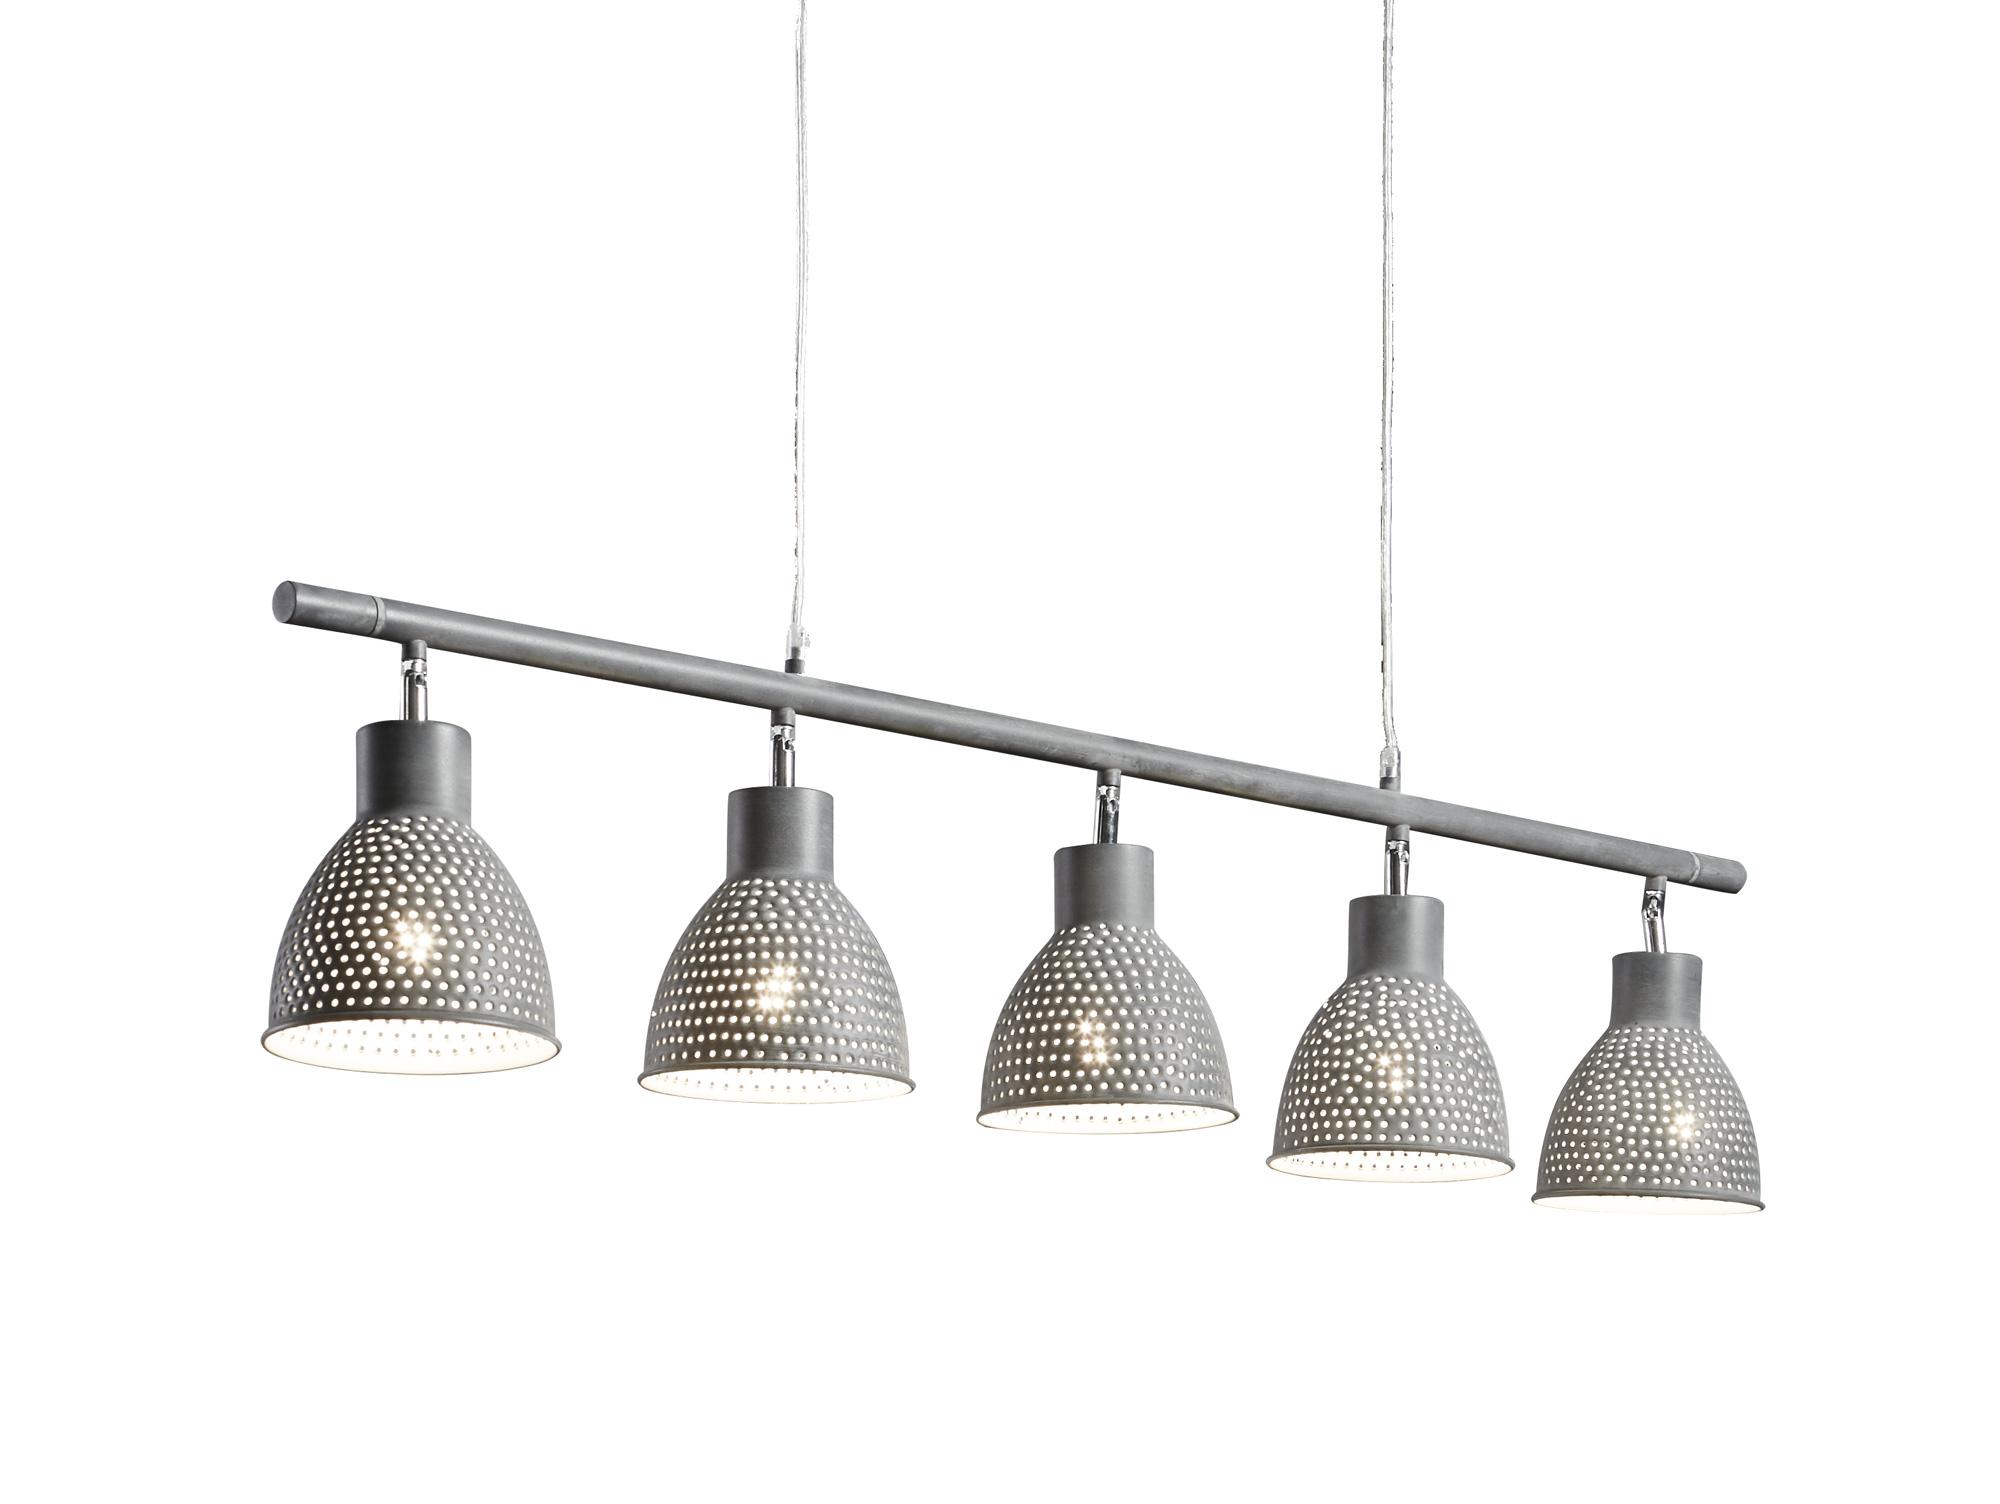 iron h ngelampe mit 5 lampen grau. Black Bedroom Furniture Sets. Home Design Ideas